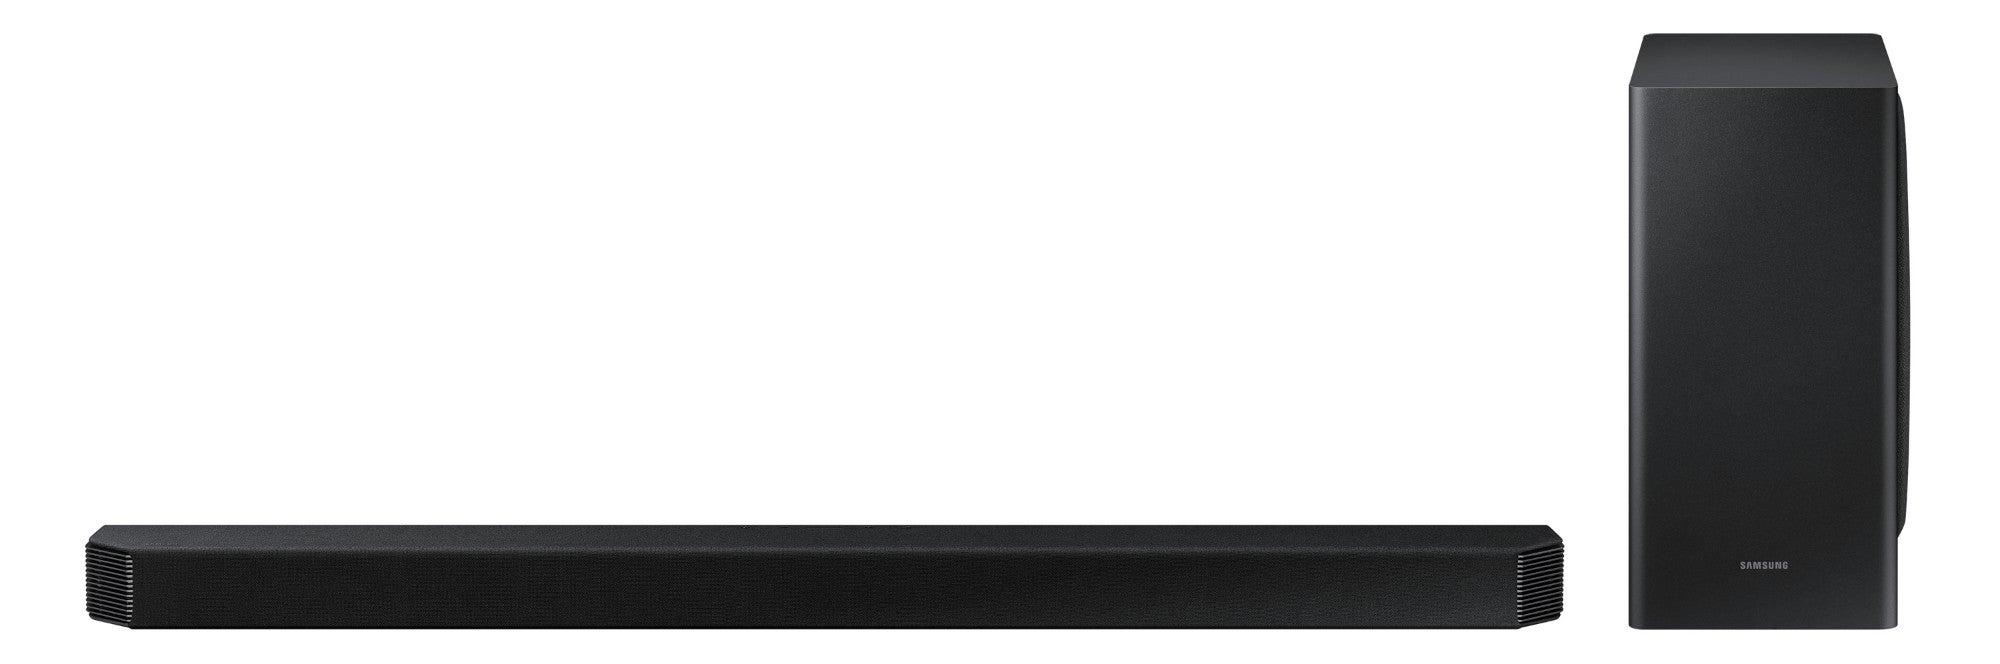 Samsung HW-Q900T 7.1.2 channels 406 W Black